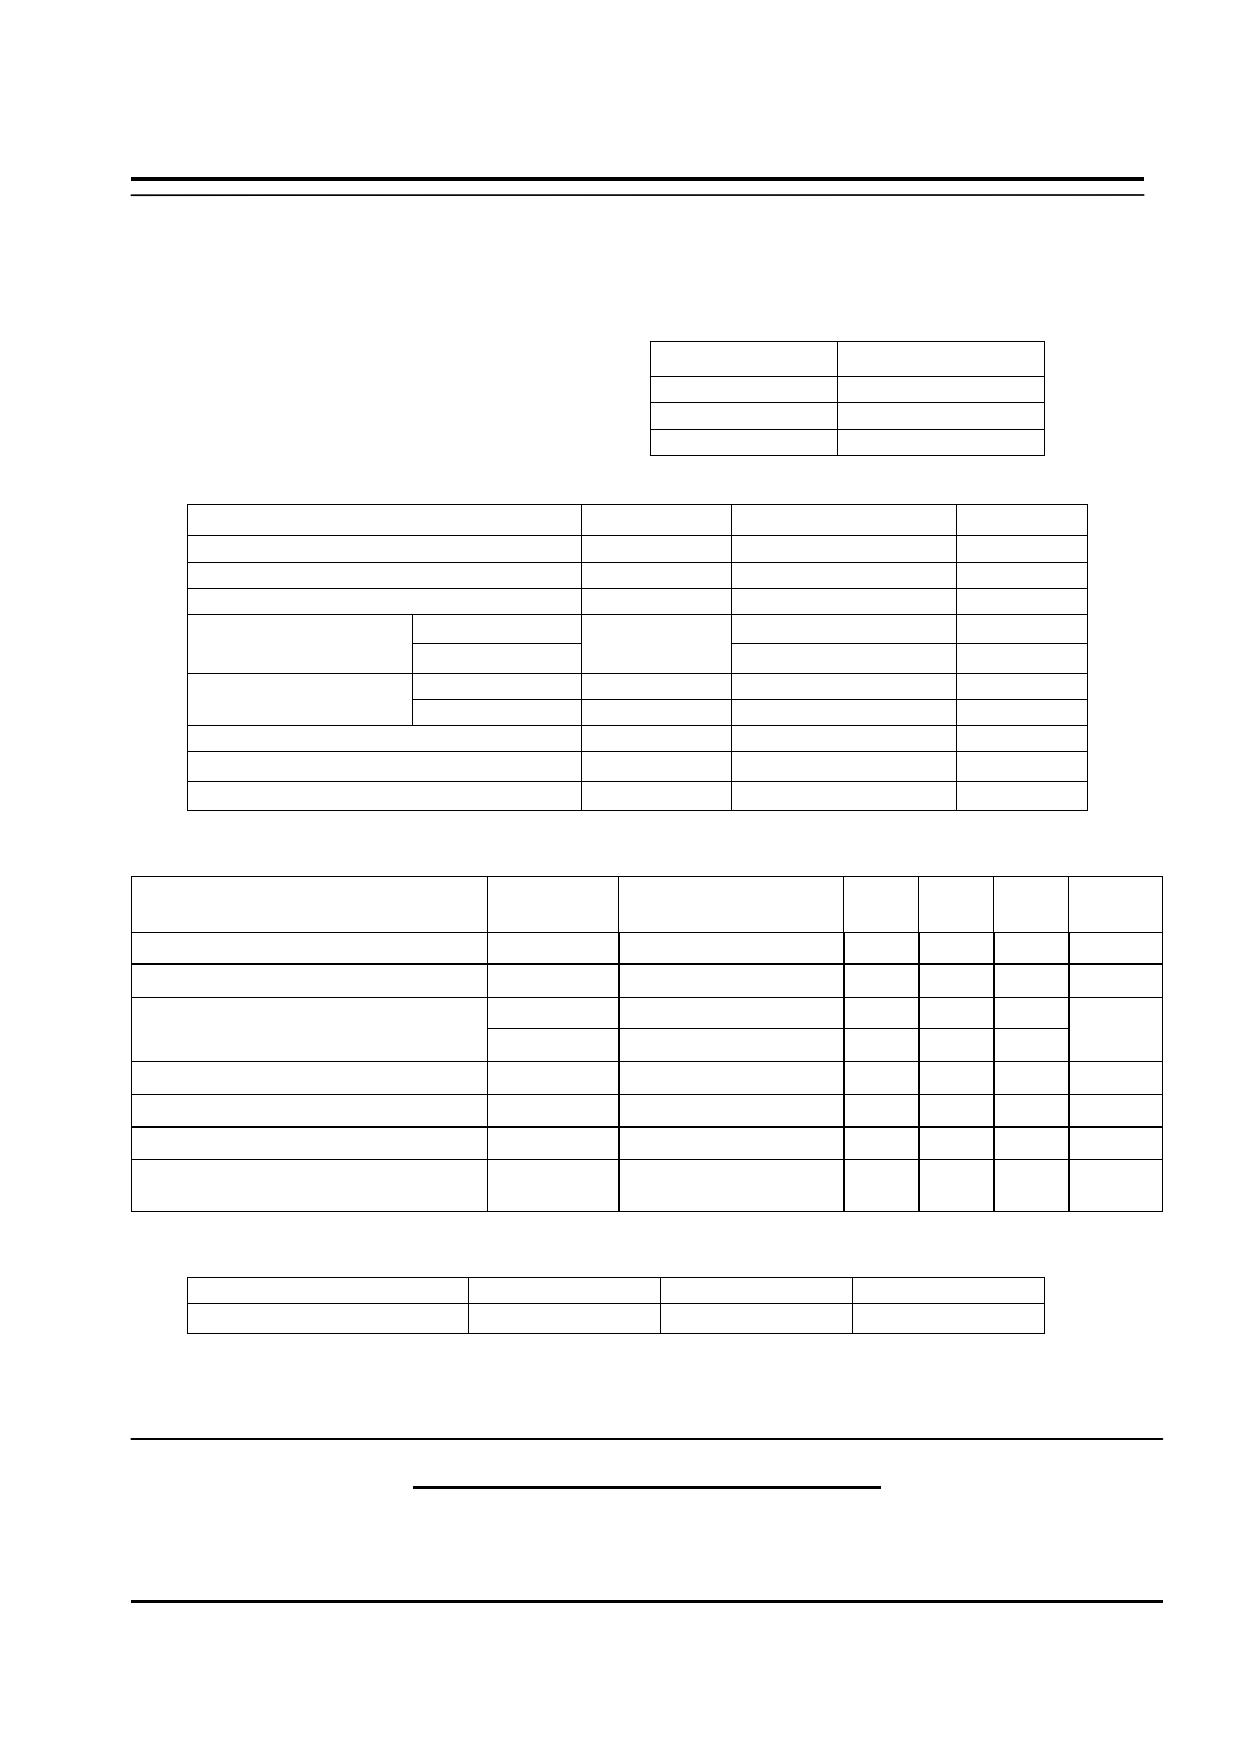 D882p datasheet